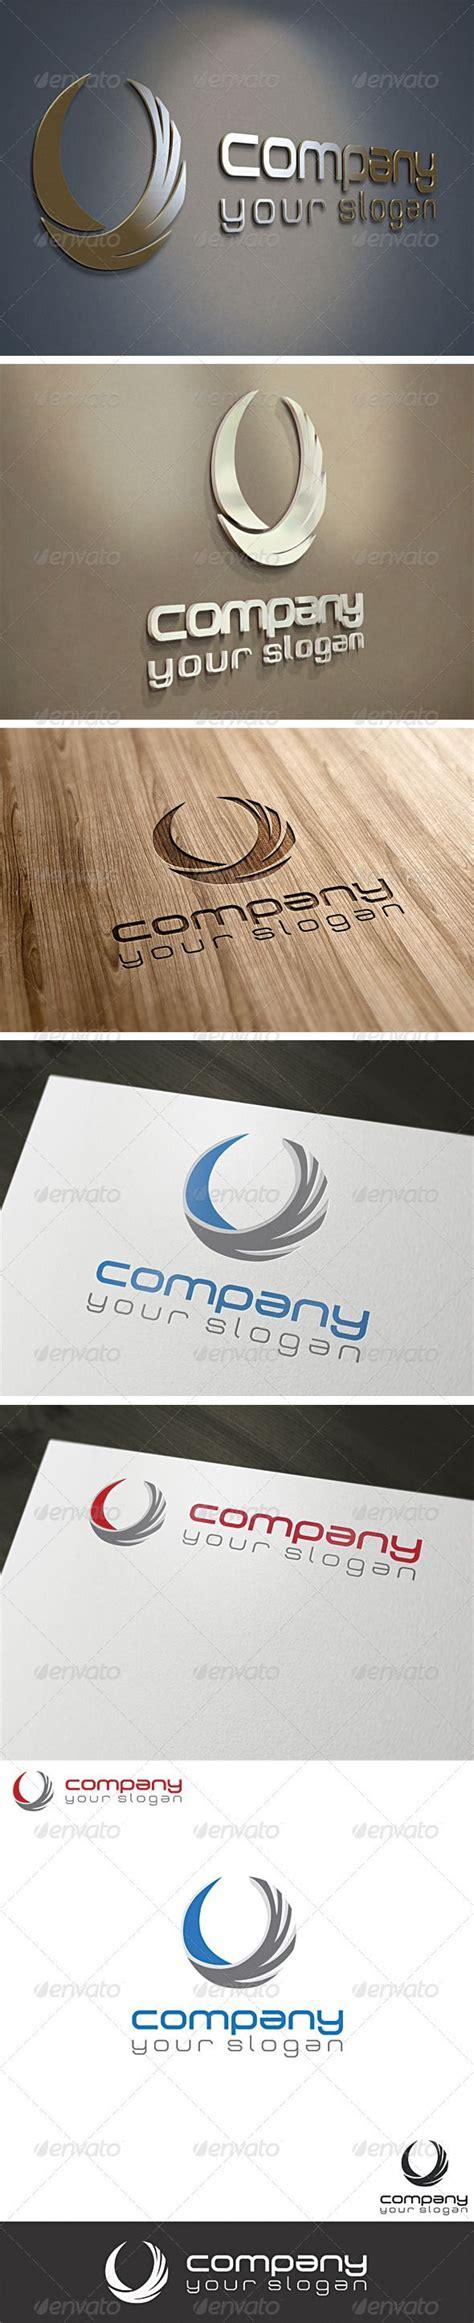 Eclipse Modify Templates by 1000 Ideas About Circle Logo Design On Pinterest Logo